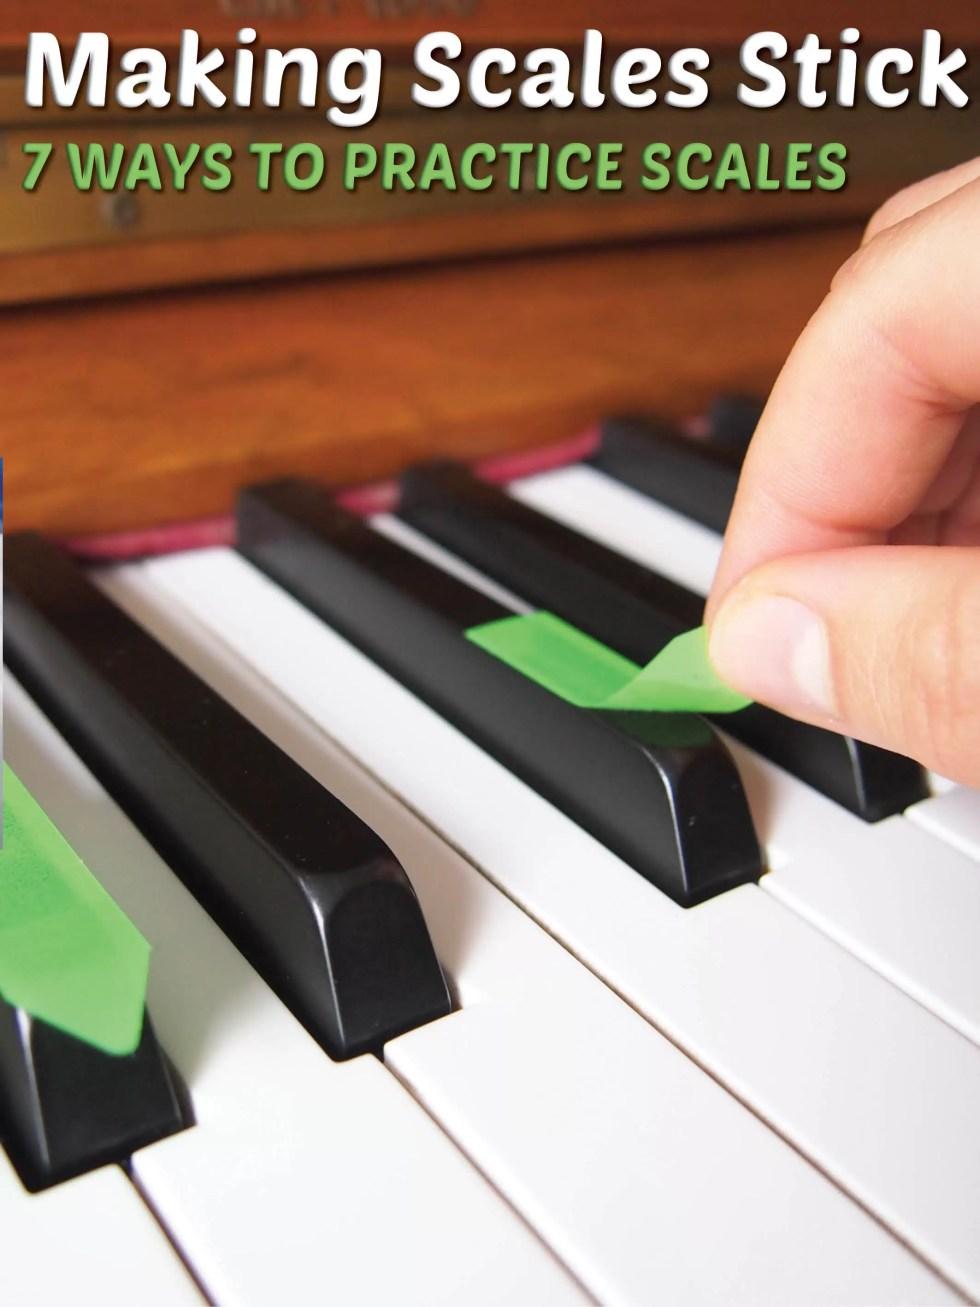 7 ways to practice scales